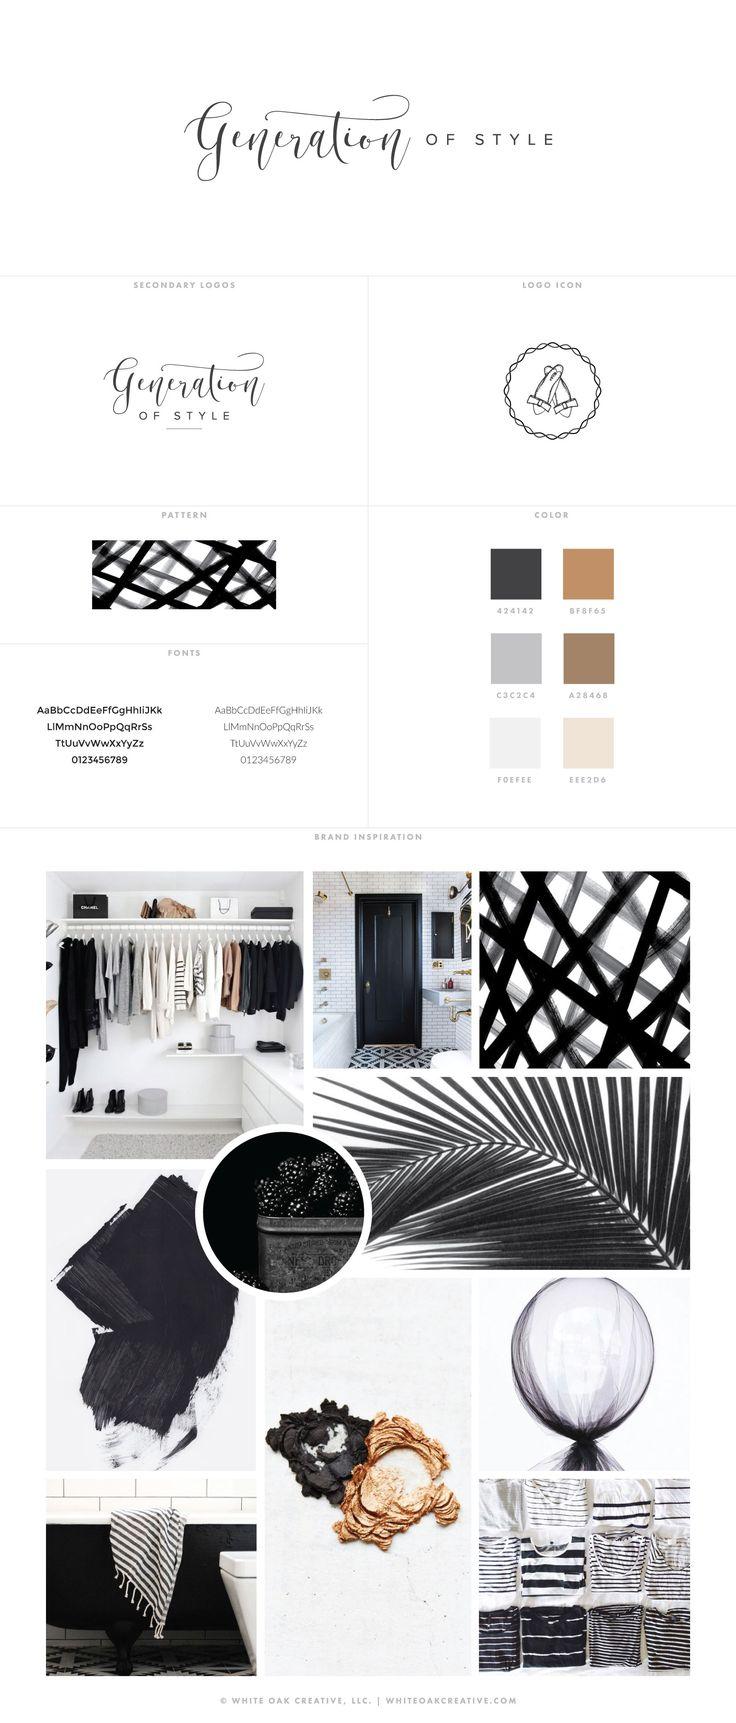 Blog Design of Generation of Style, branding and blog fashion, blog - logo design, wordpress theme, mood board inspiration, blog design idea, graphic design, branding